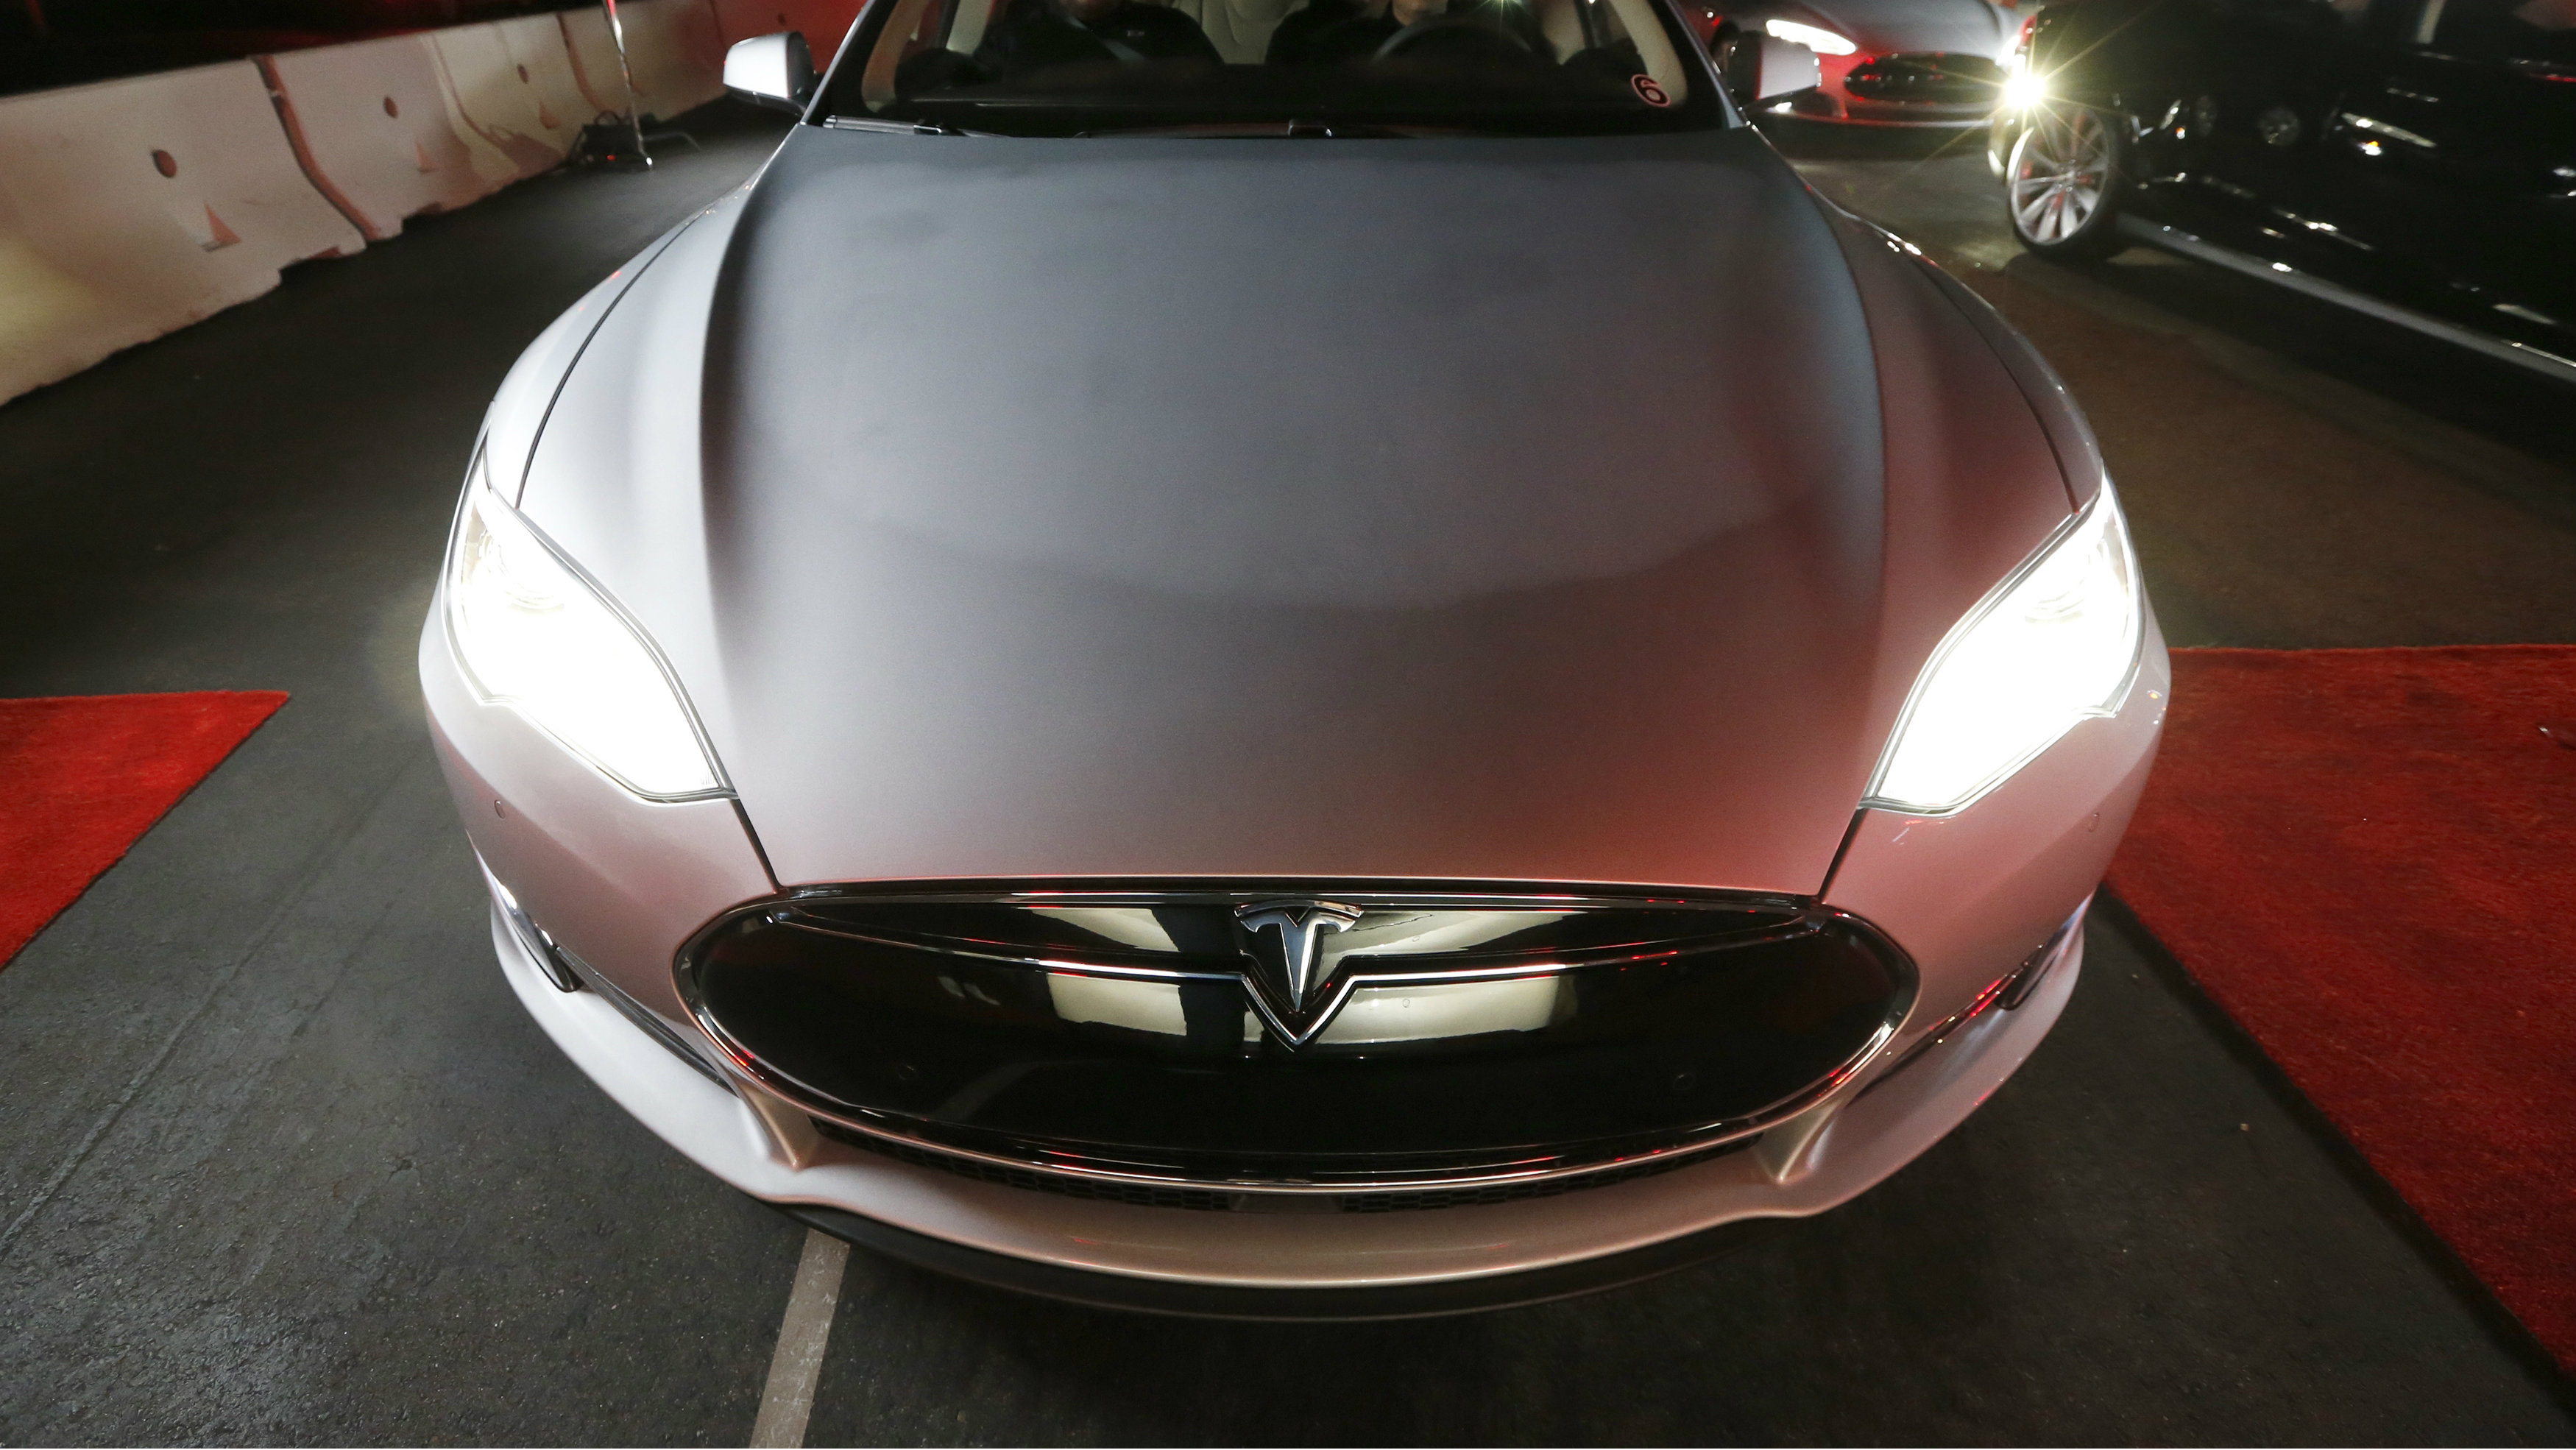 Luxury Cars For Sale Hong Kong >> Hong Kong S Love Affair With Tesla Tsla Vehicles Looks Set To